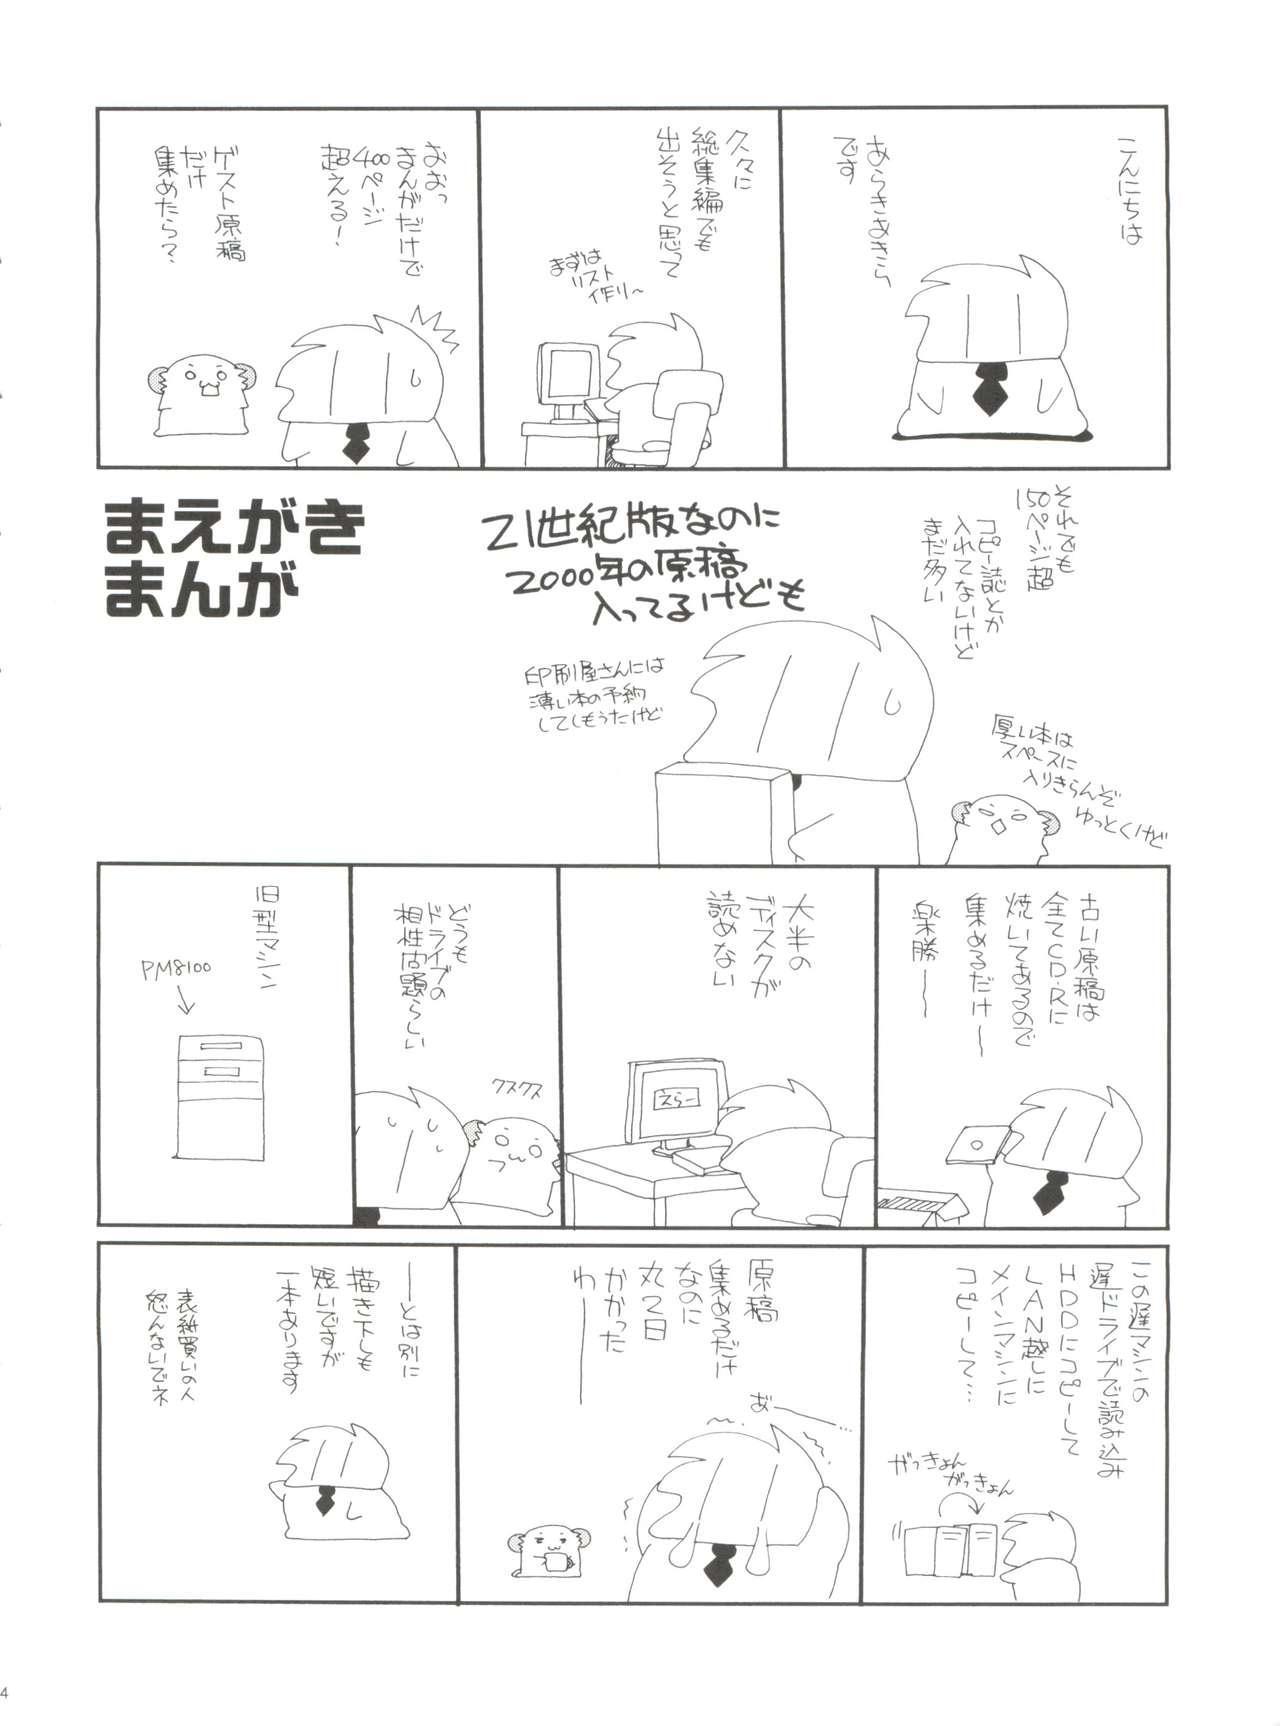 21 Seikihan Part 1 3